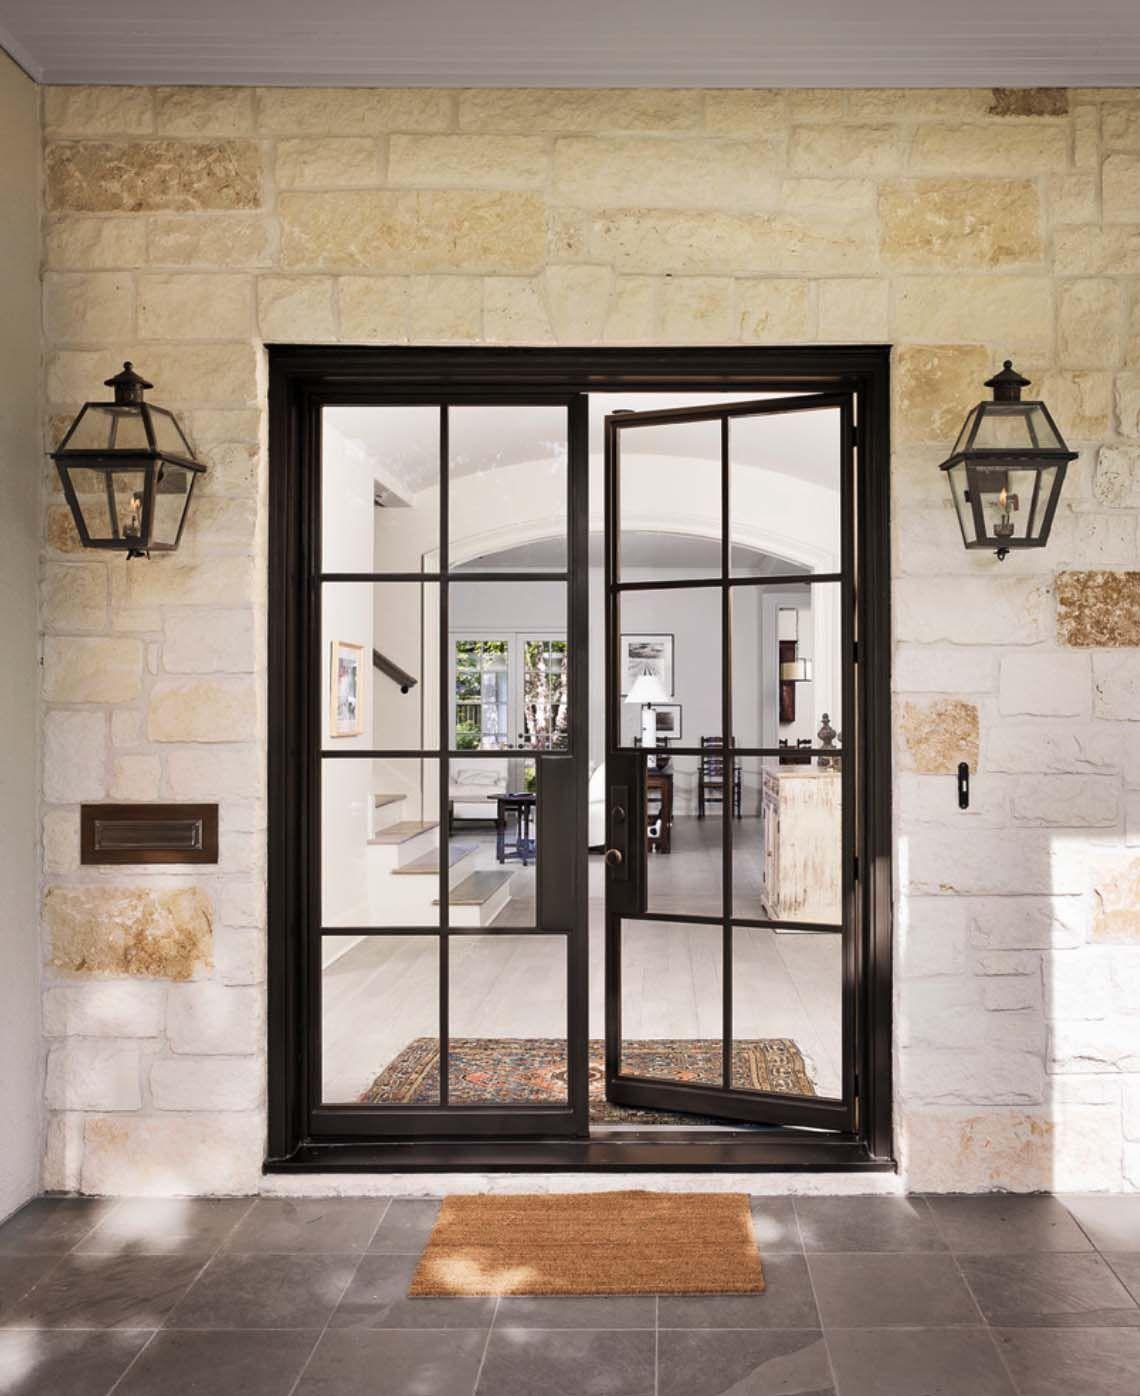 Beautifully renovated texan farmhouse captures the